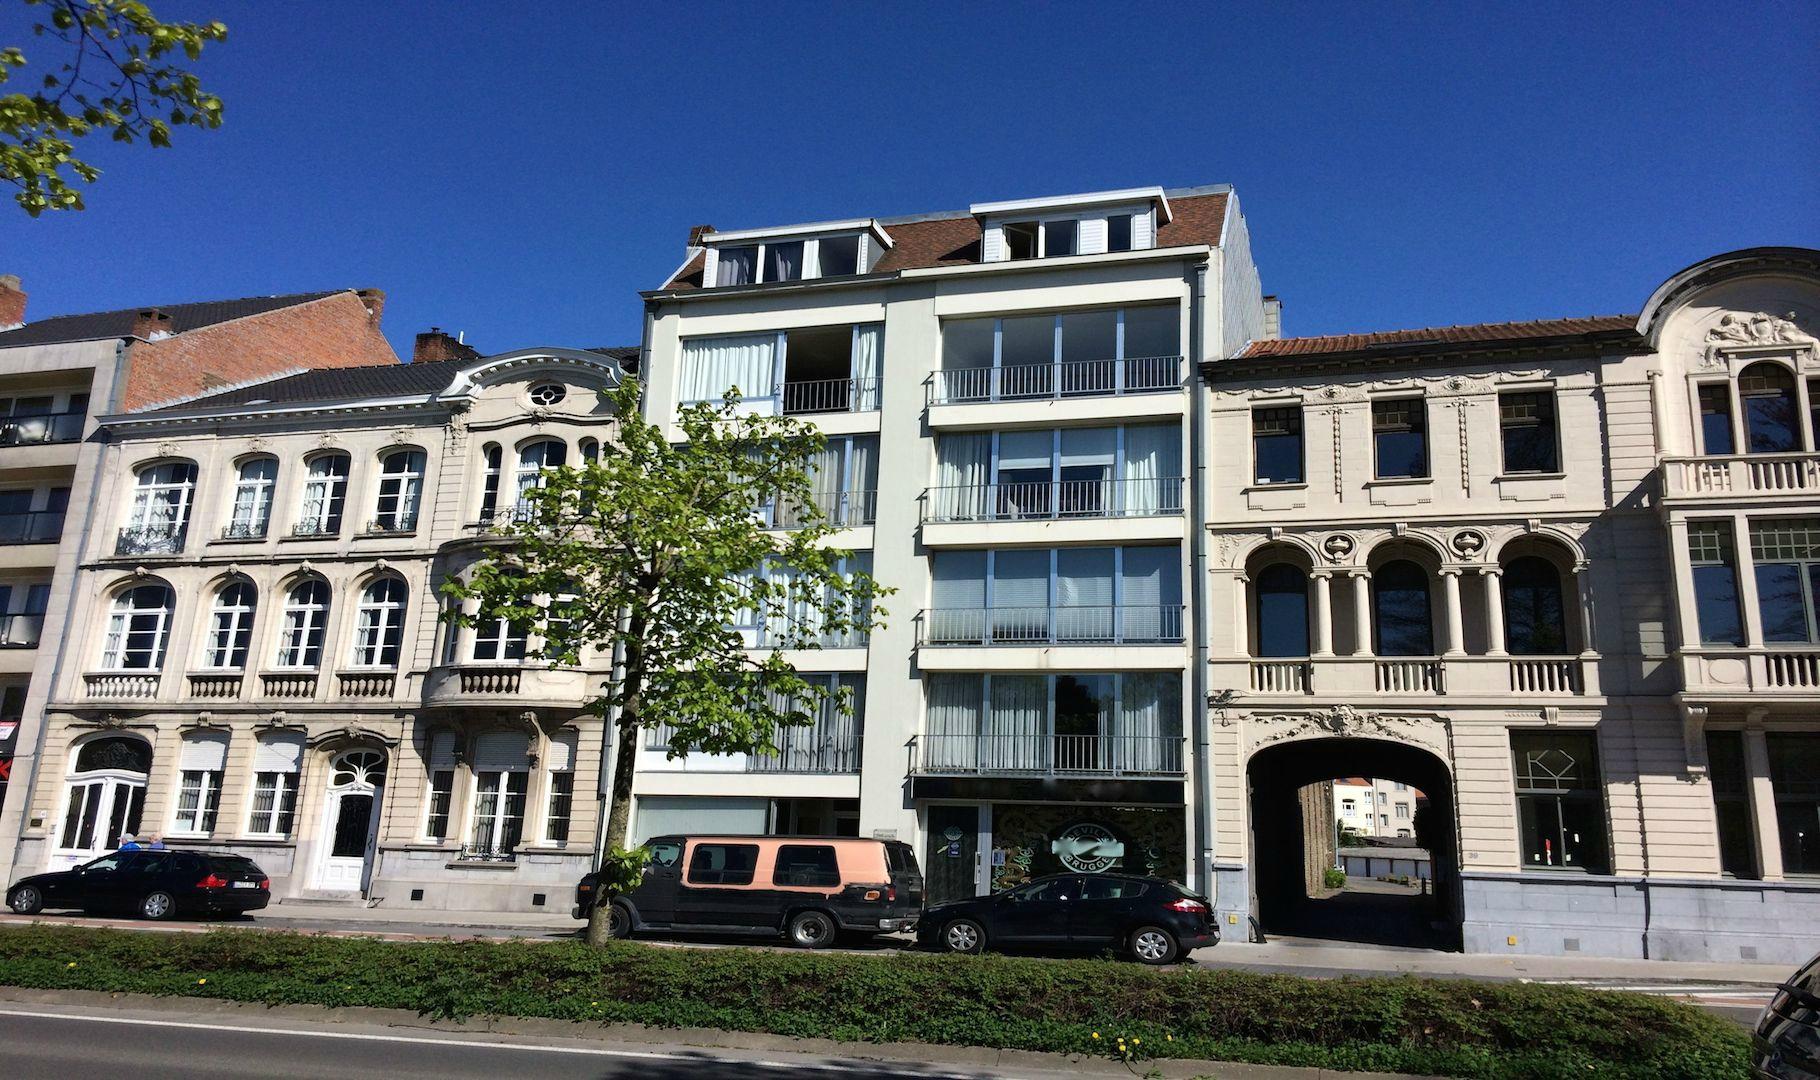 Knap gerestyled 2 slaapkamer APPARTEMENT met zonnig terras – Zicht op 't Stil Ende en alle Brugse torens +50€ Algemene Kosten +30€ water